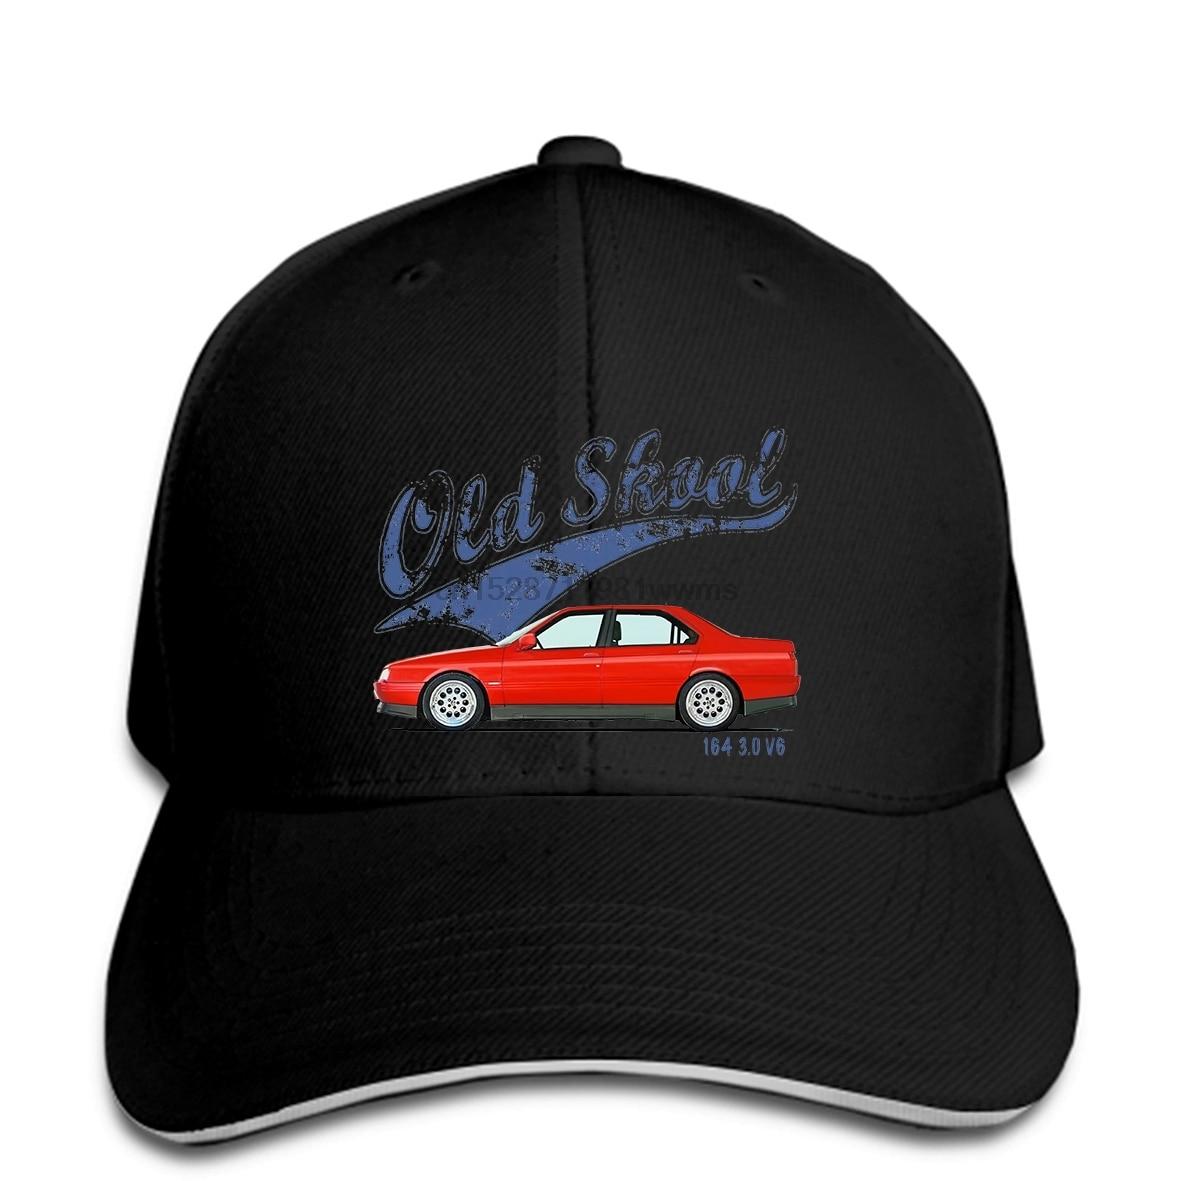 RETRO. CLASSIC CAR ALFA ROMEO 916 SPIDER t-shirt OLD SKOOL MODIFIED